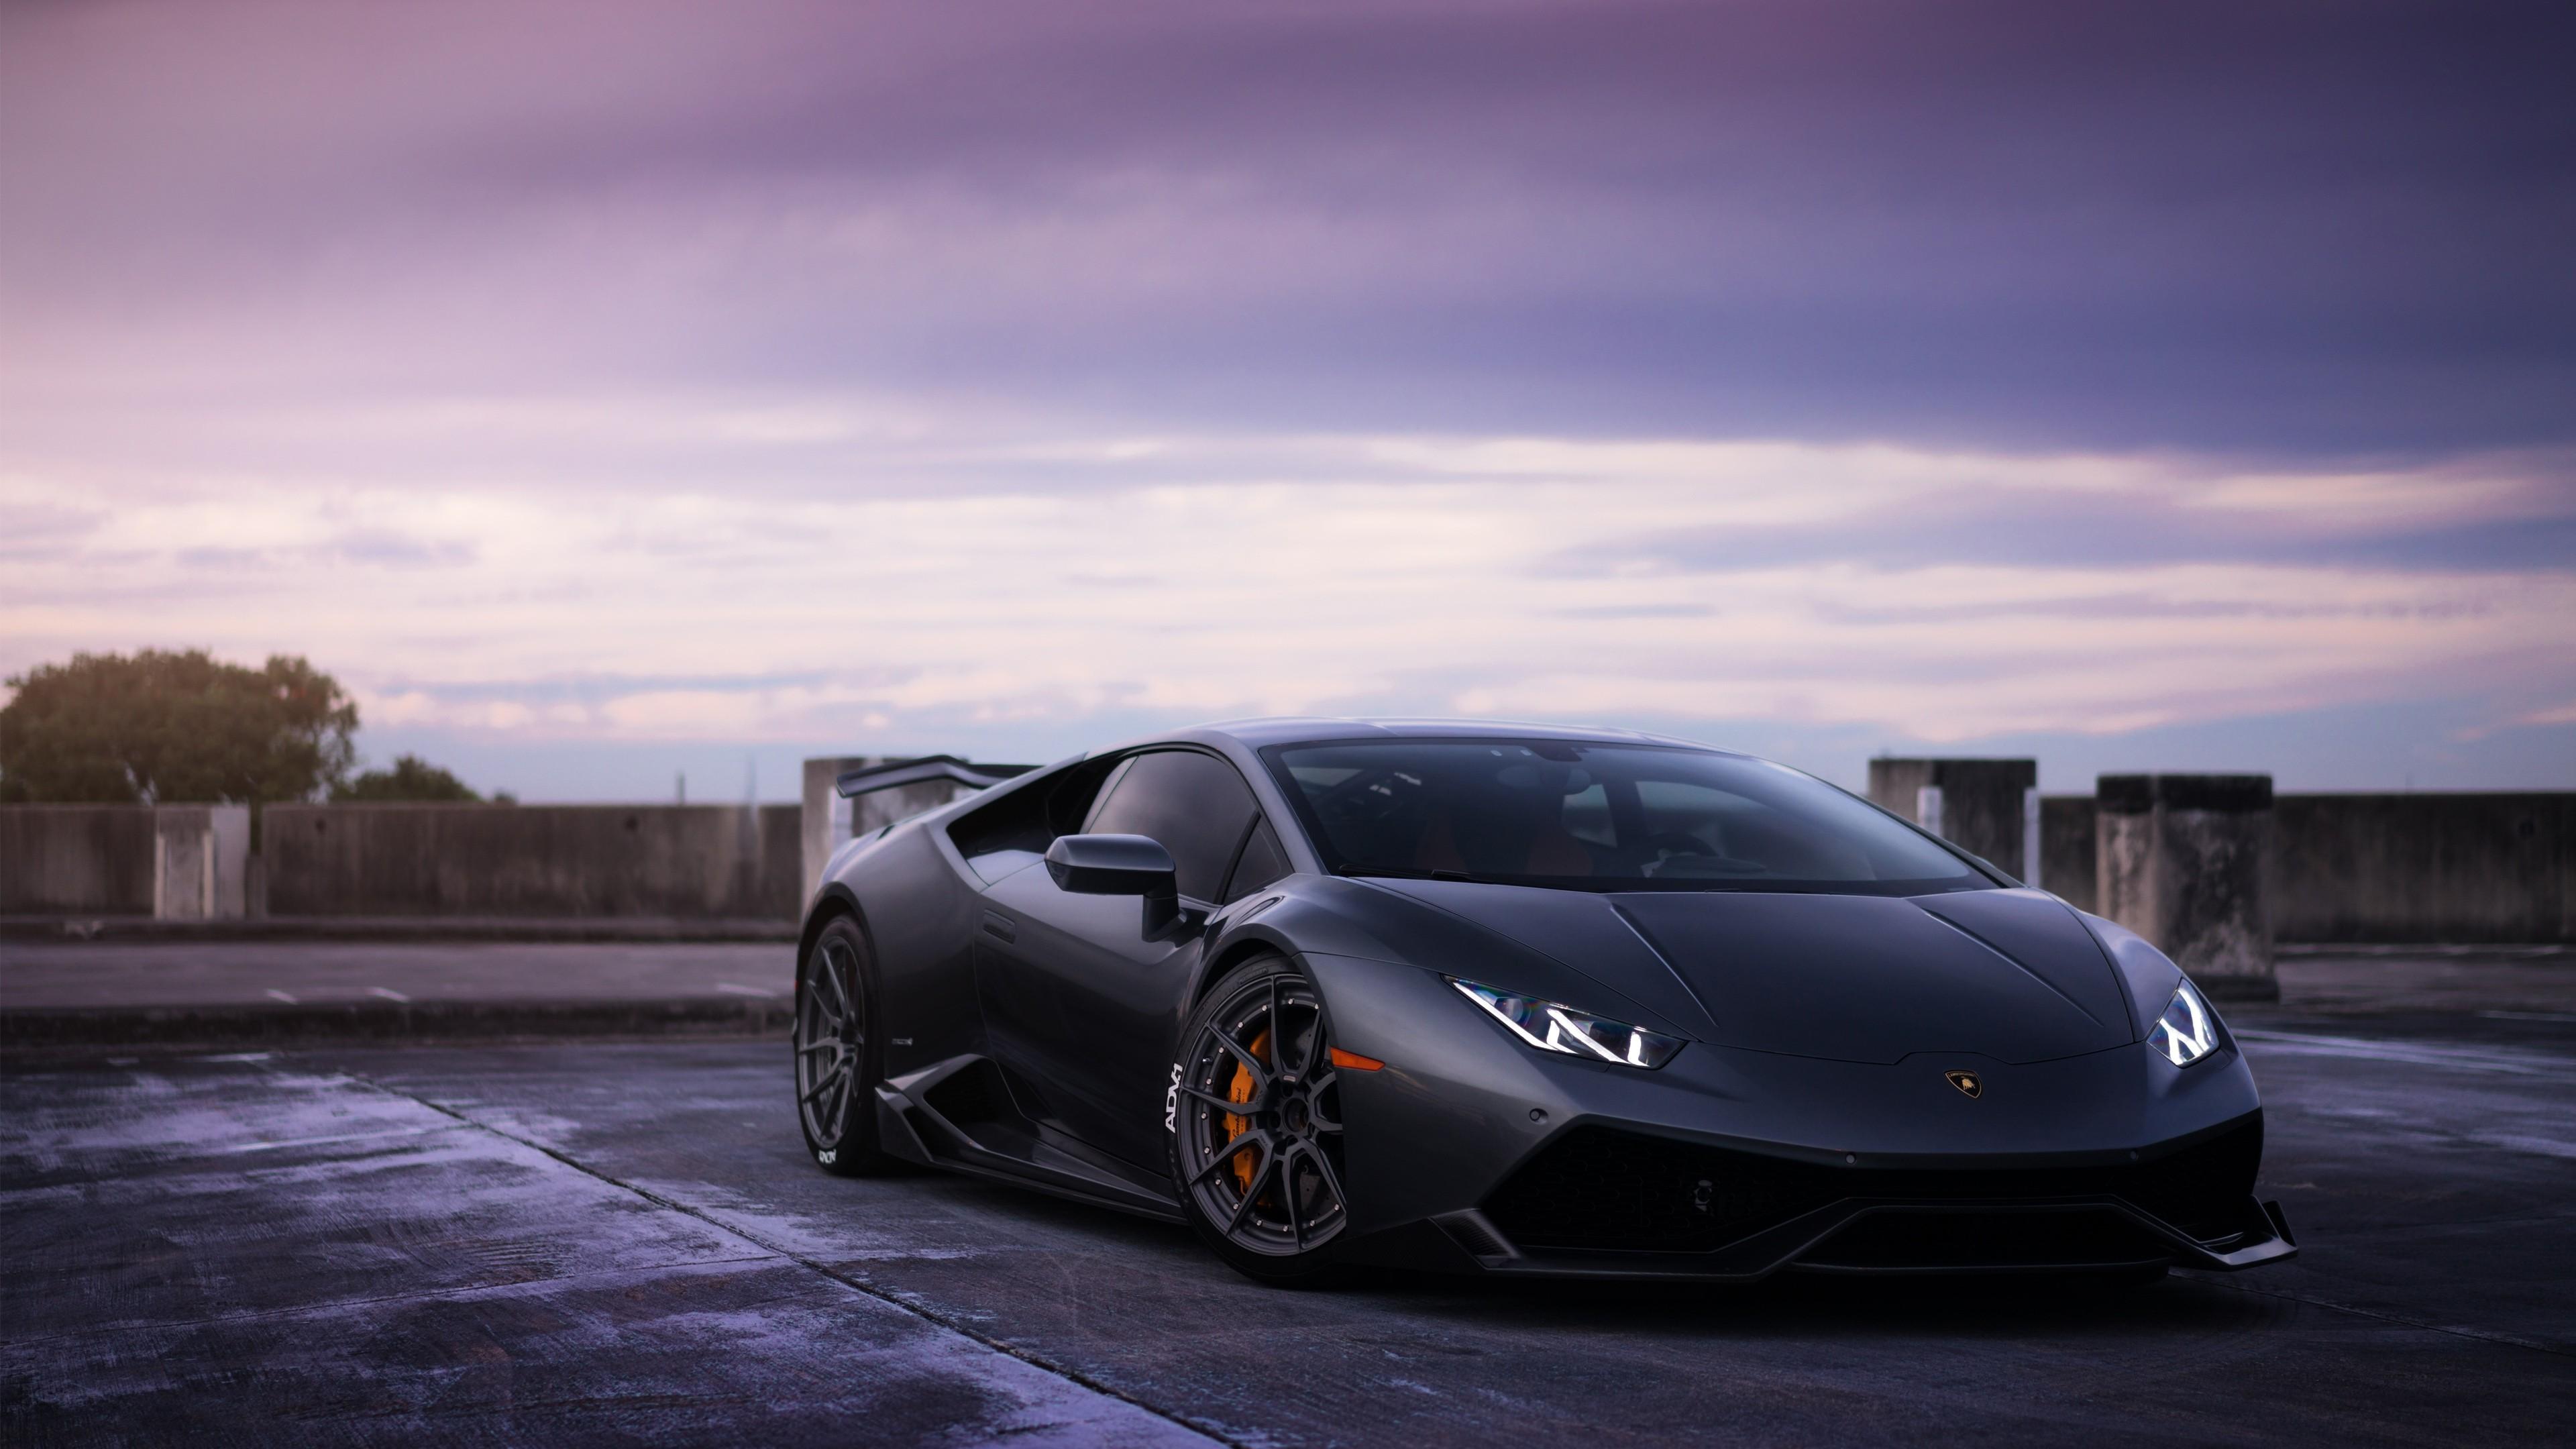 Lamborghini Huracan On Adv1 Wheels 3 Wallpaper  Hd Car